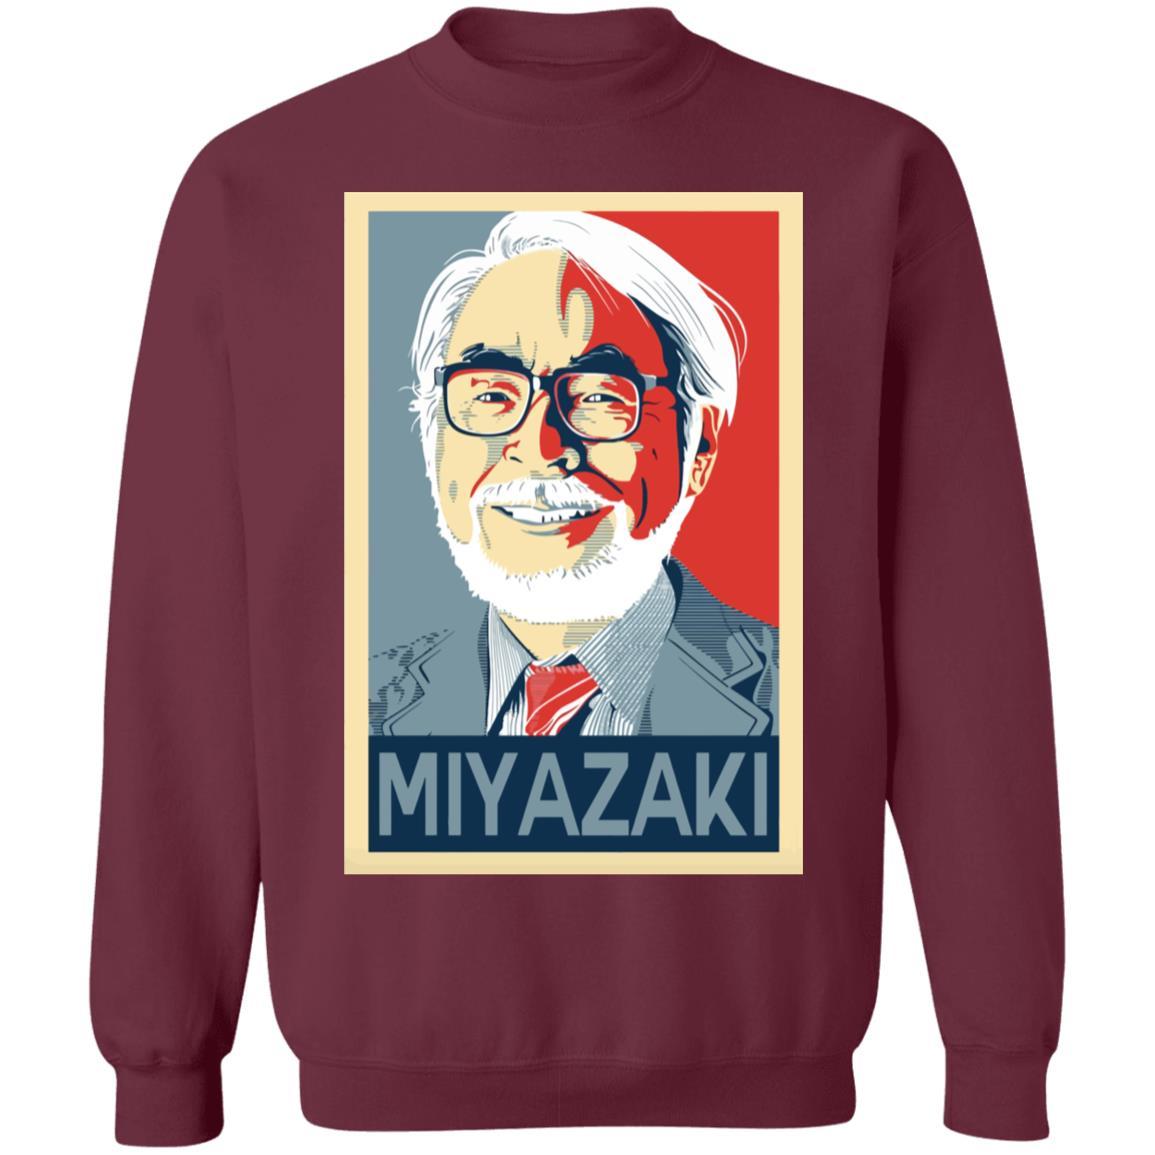 Hayao Miyazaki Studio Ghibli Sweatshirt